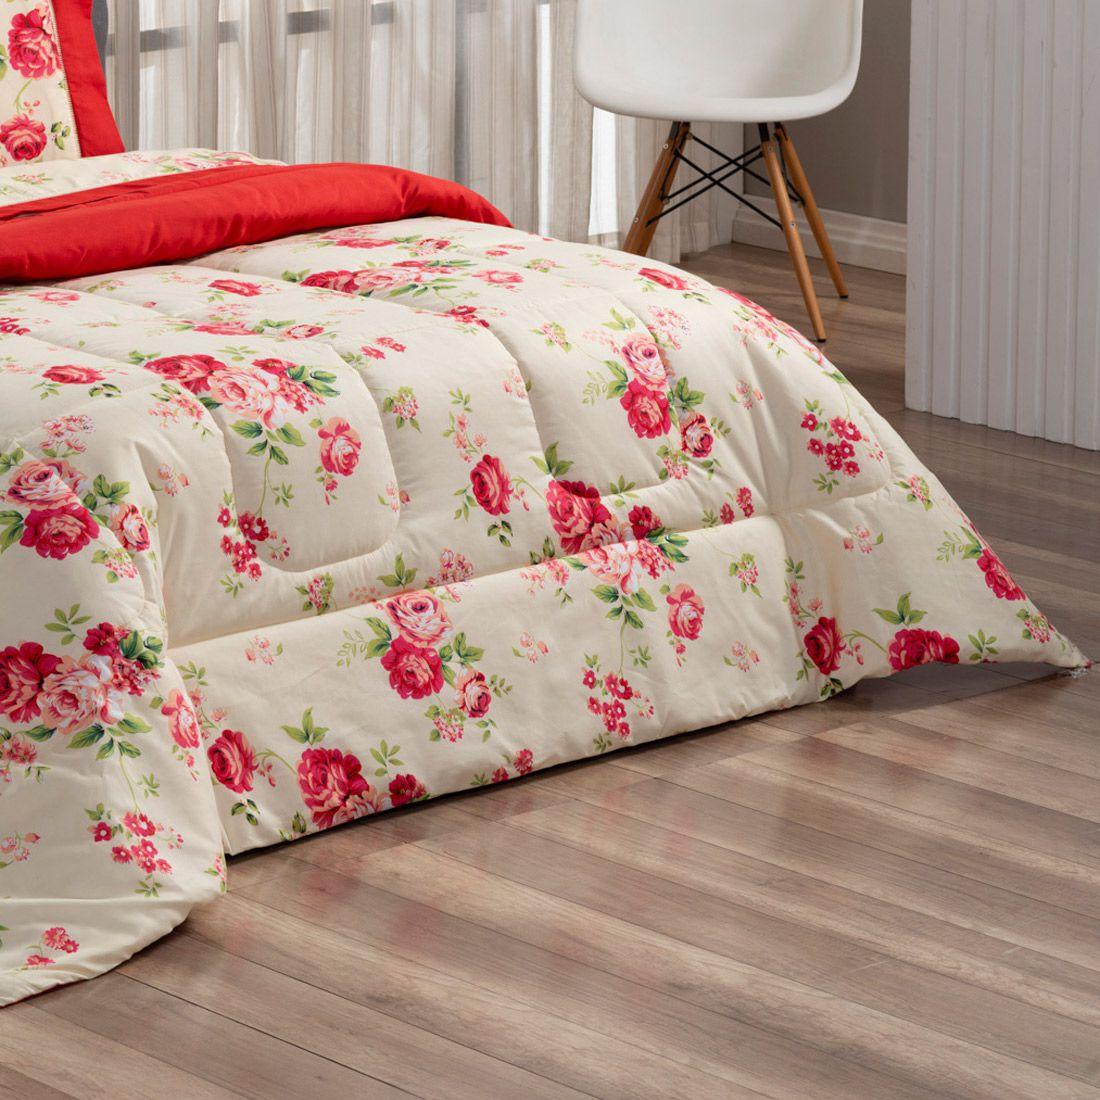 Kit Edredom Forest Floral Vermelho Queen Micropercal 200 Fios Dupla Face 03 Peças